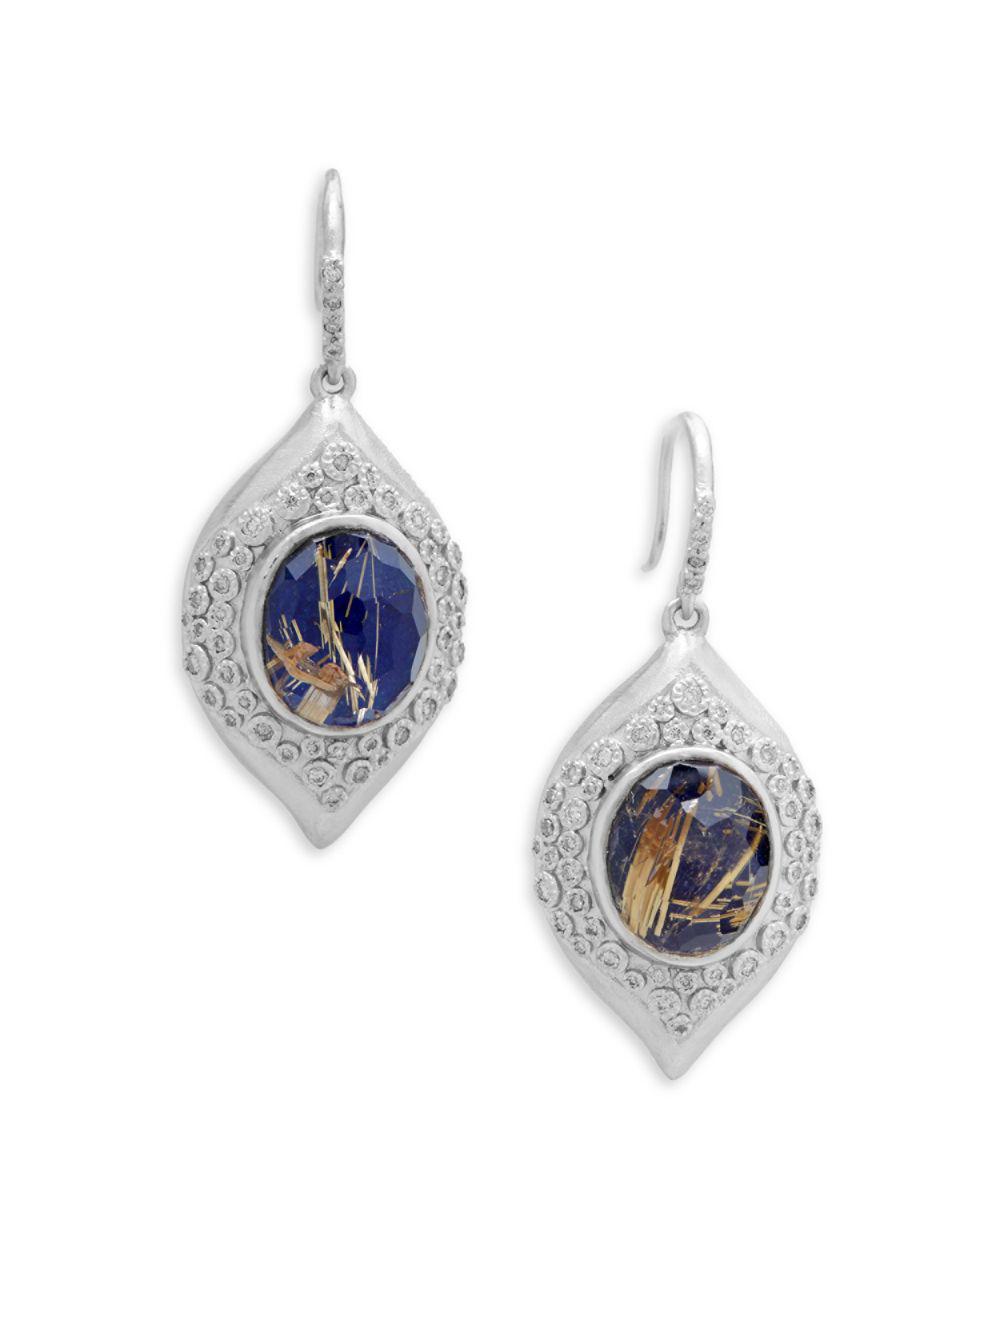 Armenta New World Midnight Triplet Drop Earrings with Diamonds jBFpUXBI